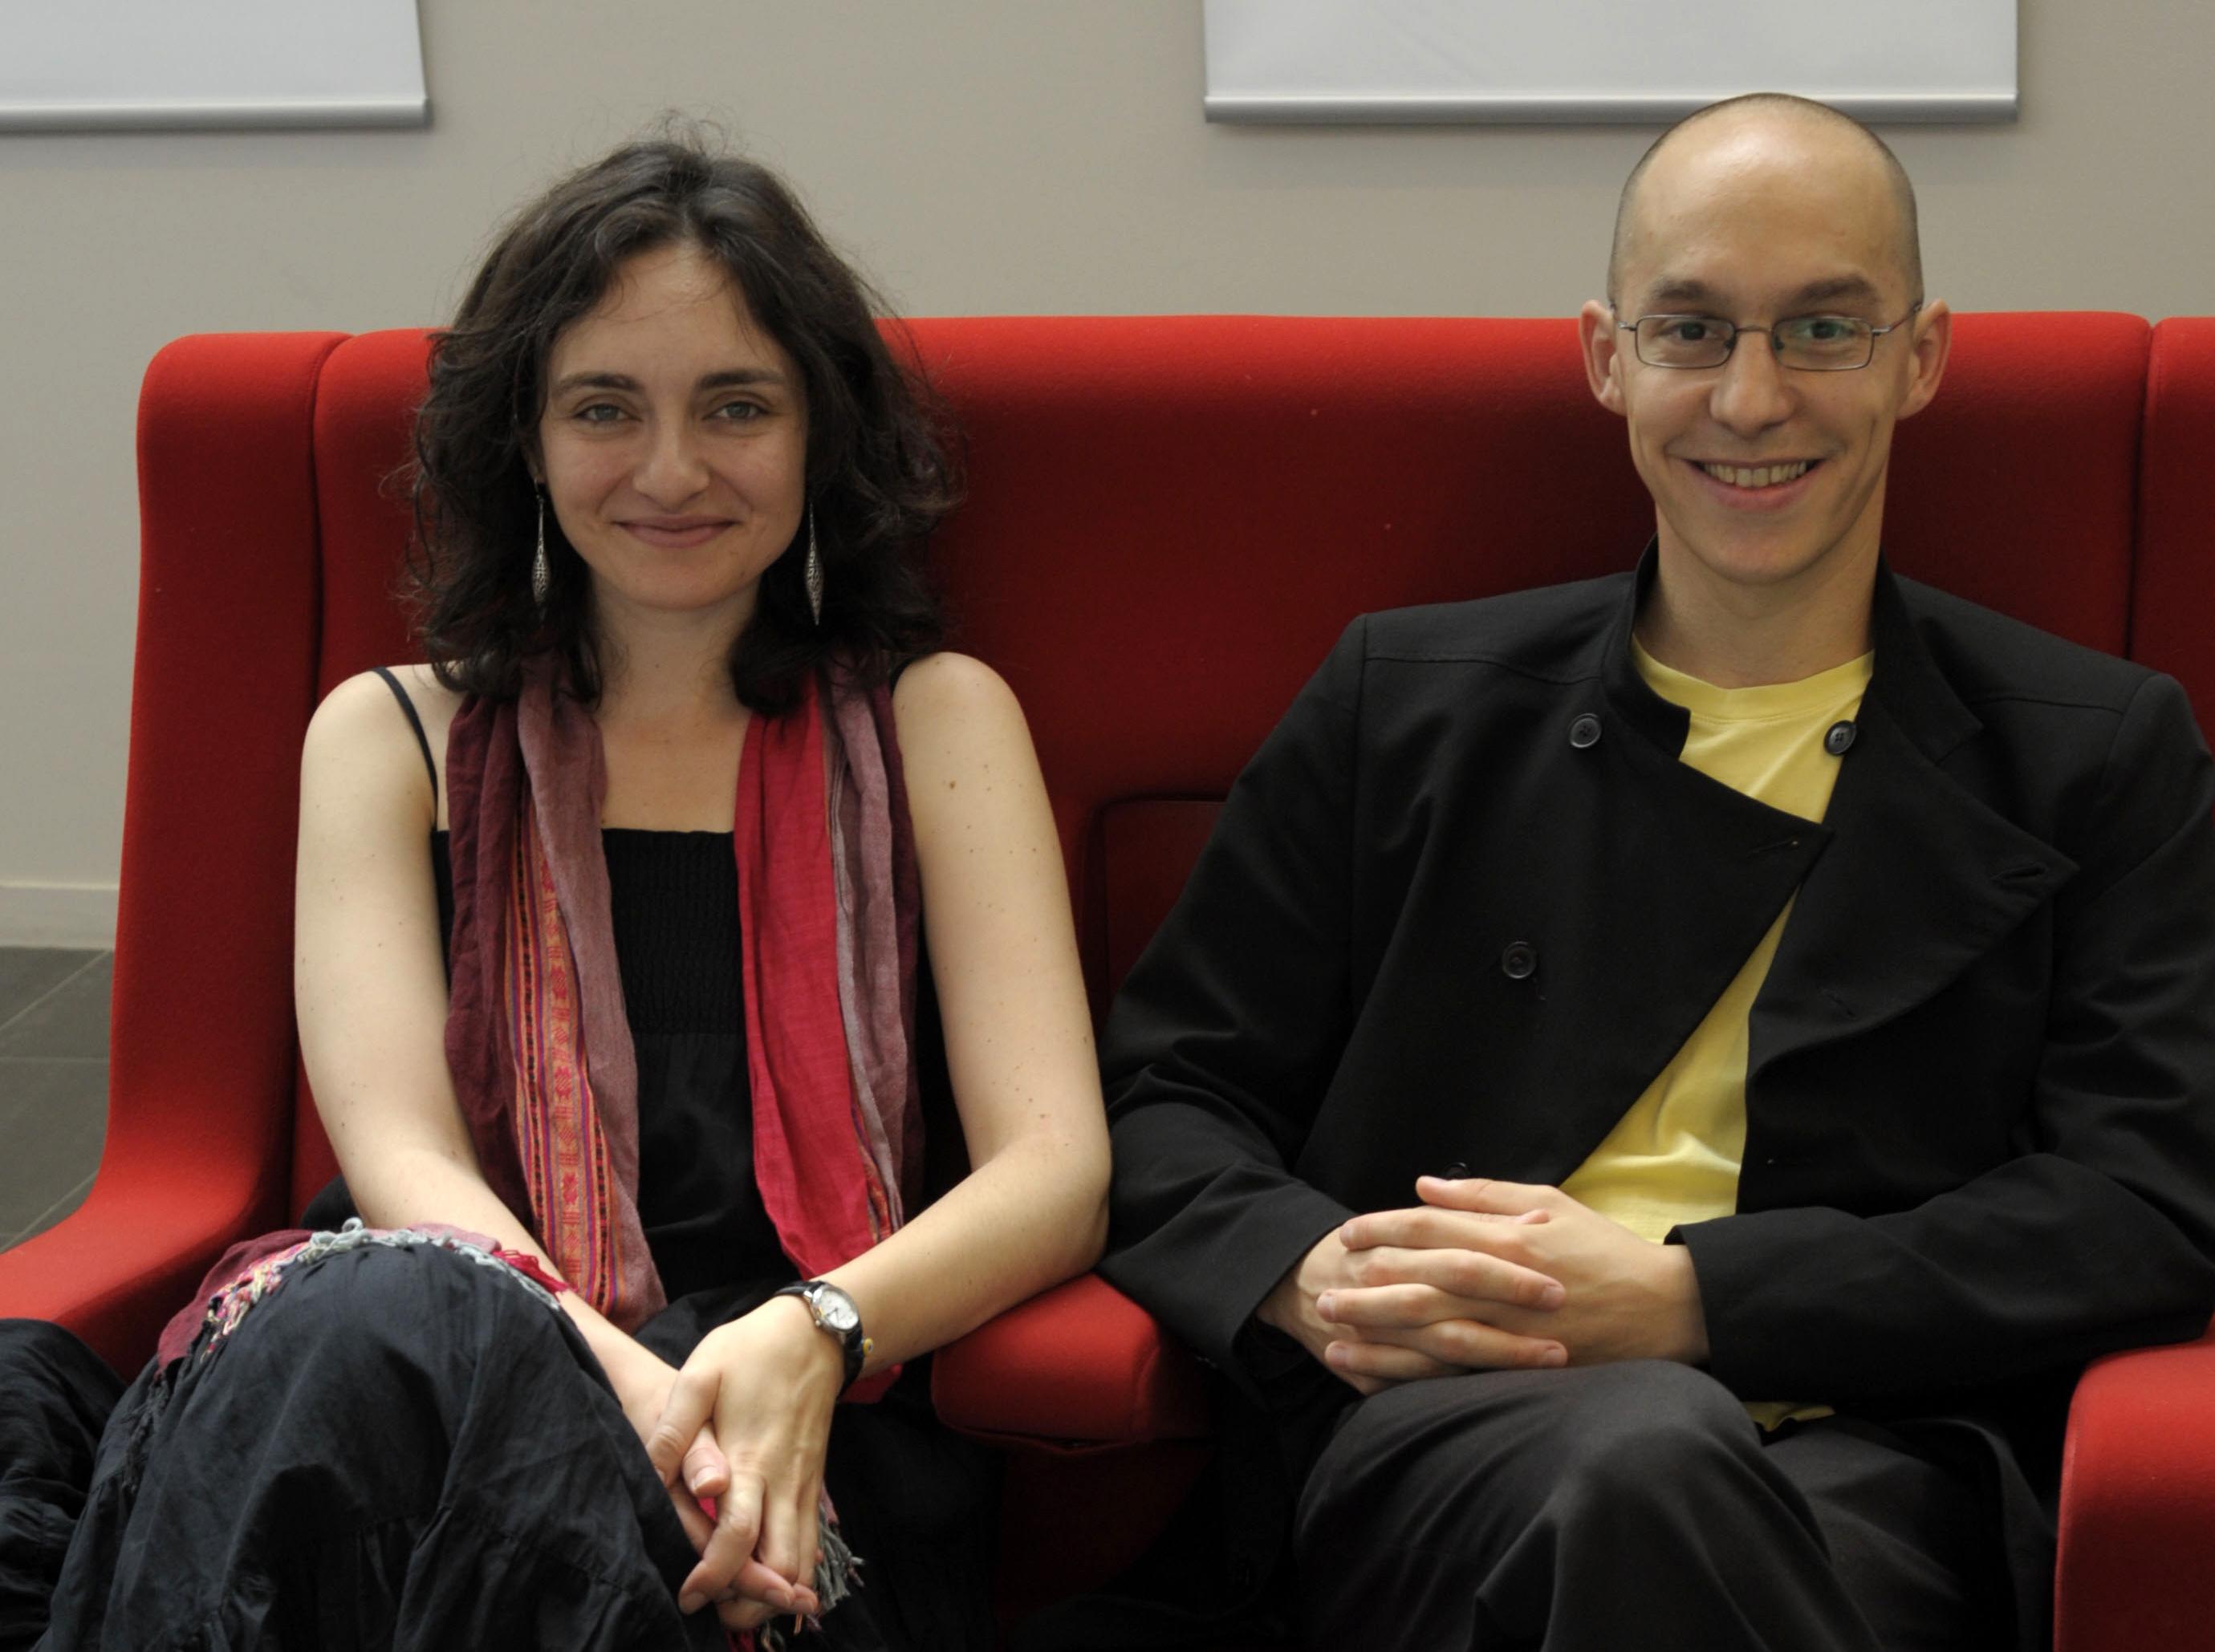 Çağla Zencirci & Guillaume Giovanetti